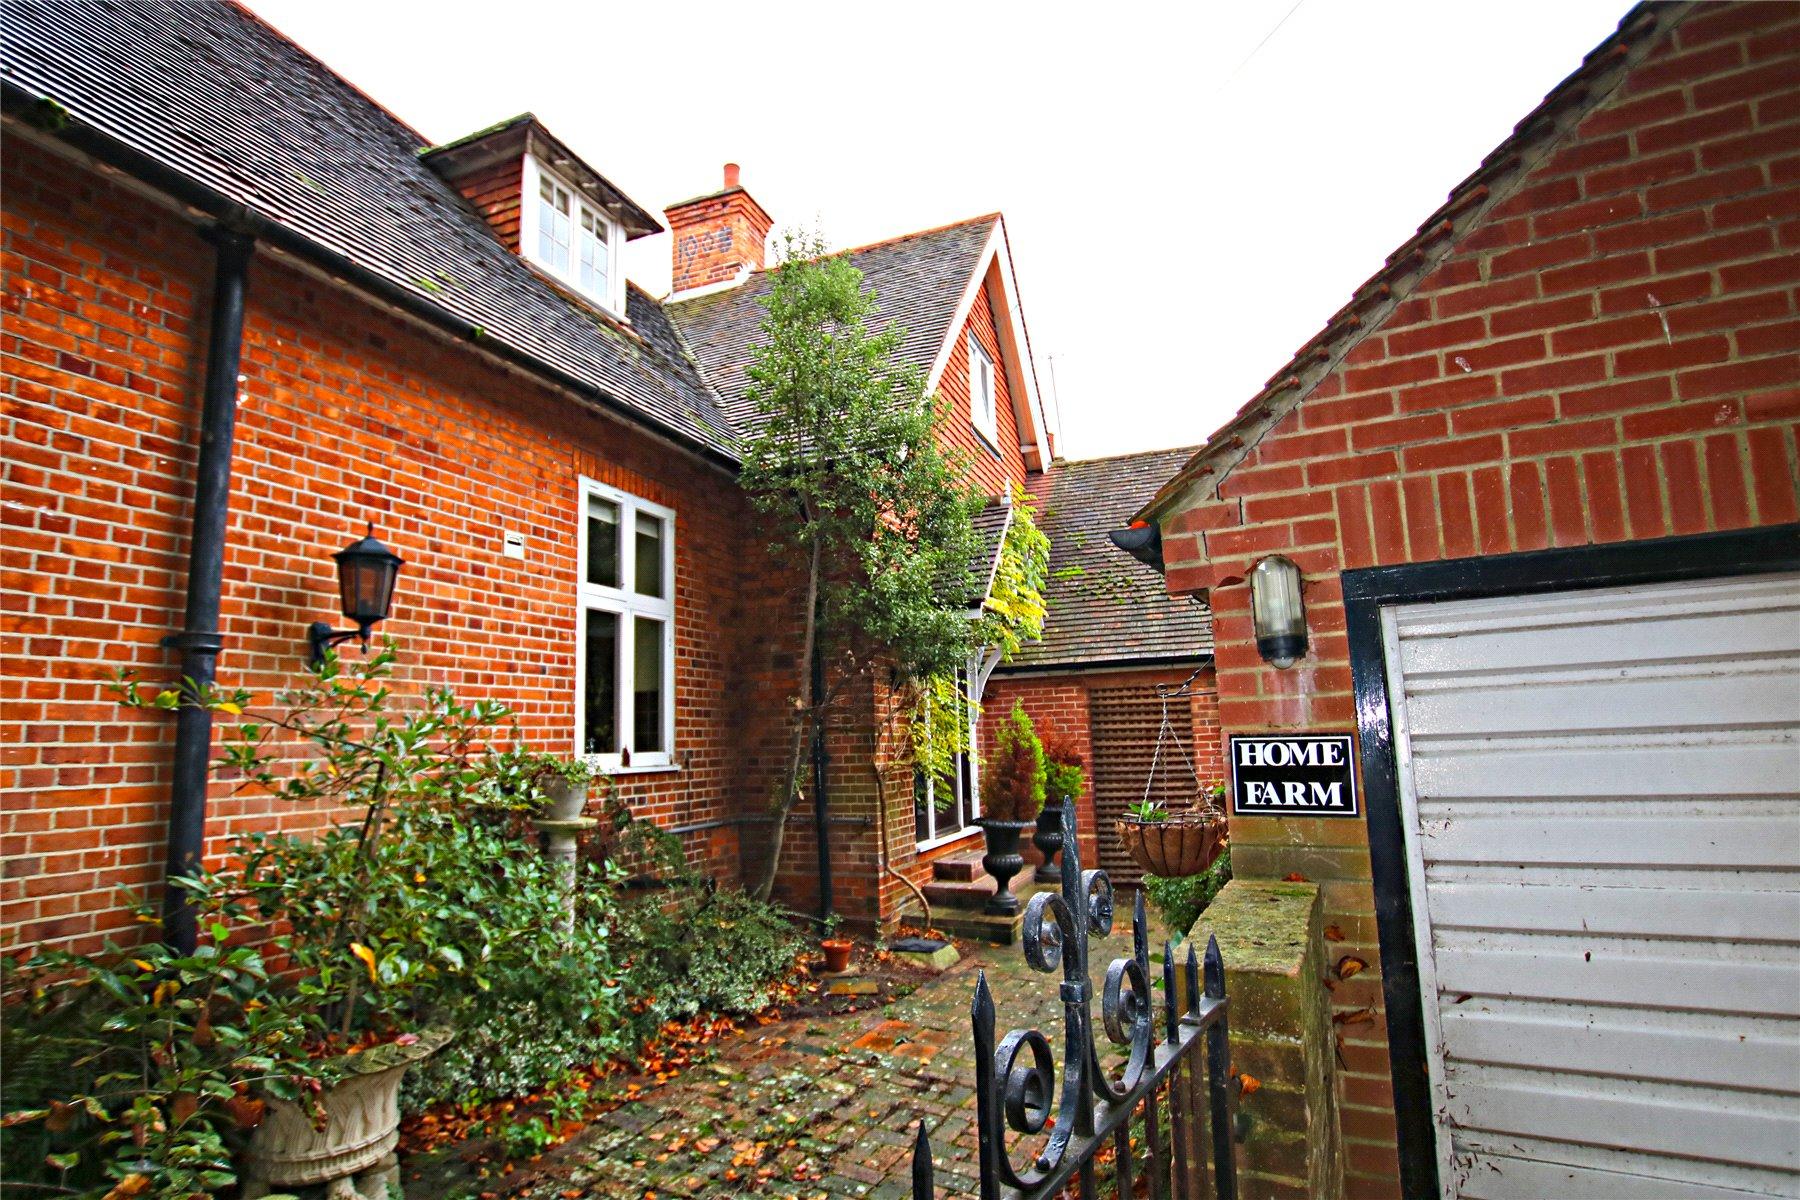 3 Bedrooms Detached House for sale in Mill Lane, Byfleet, Surrey, KT14